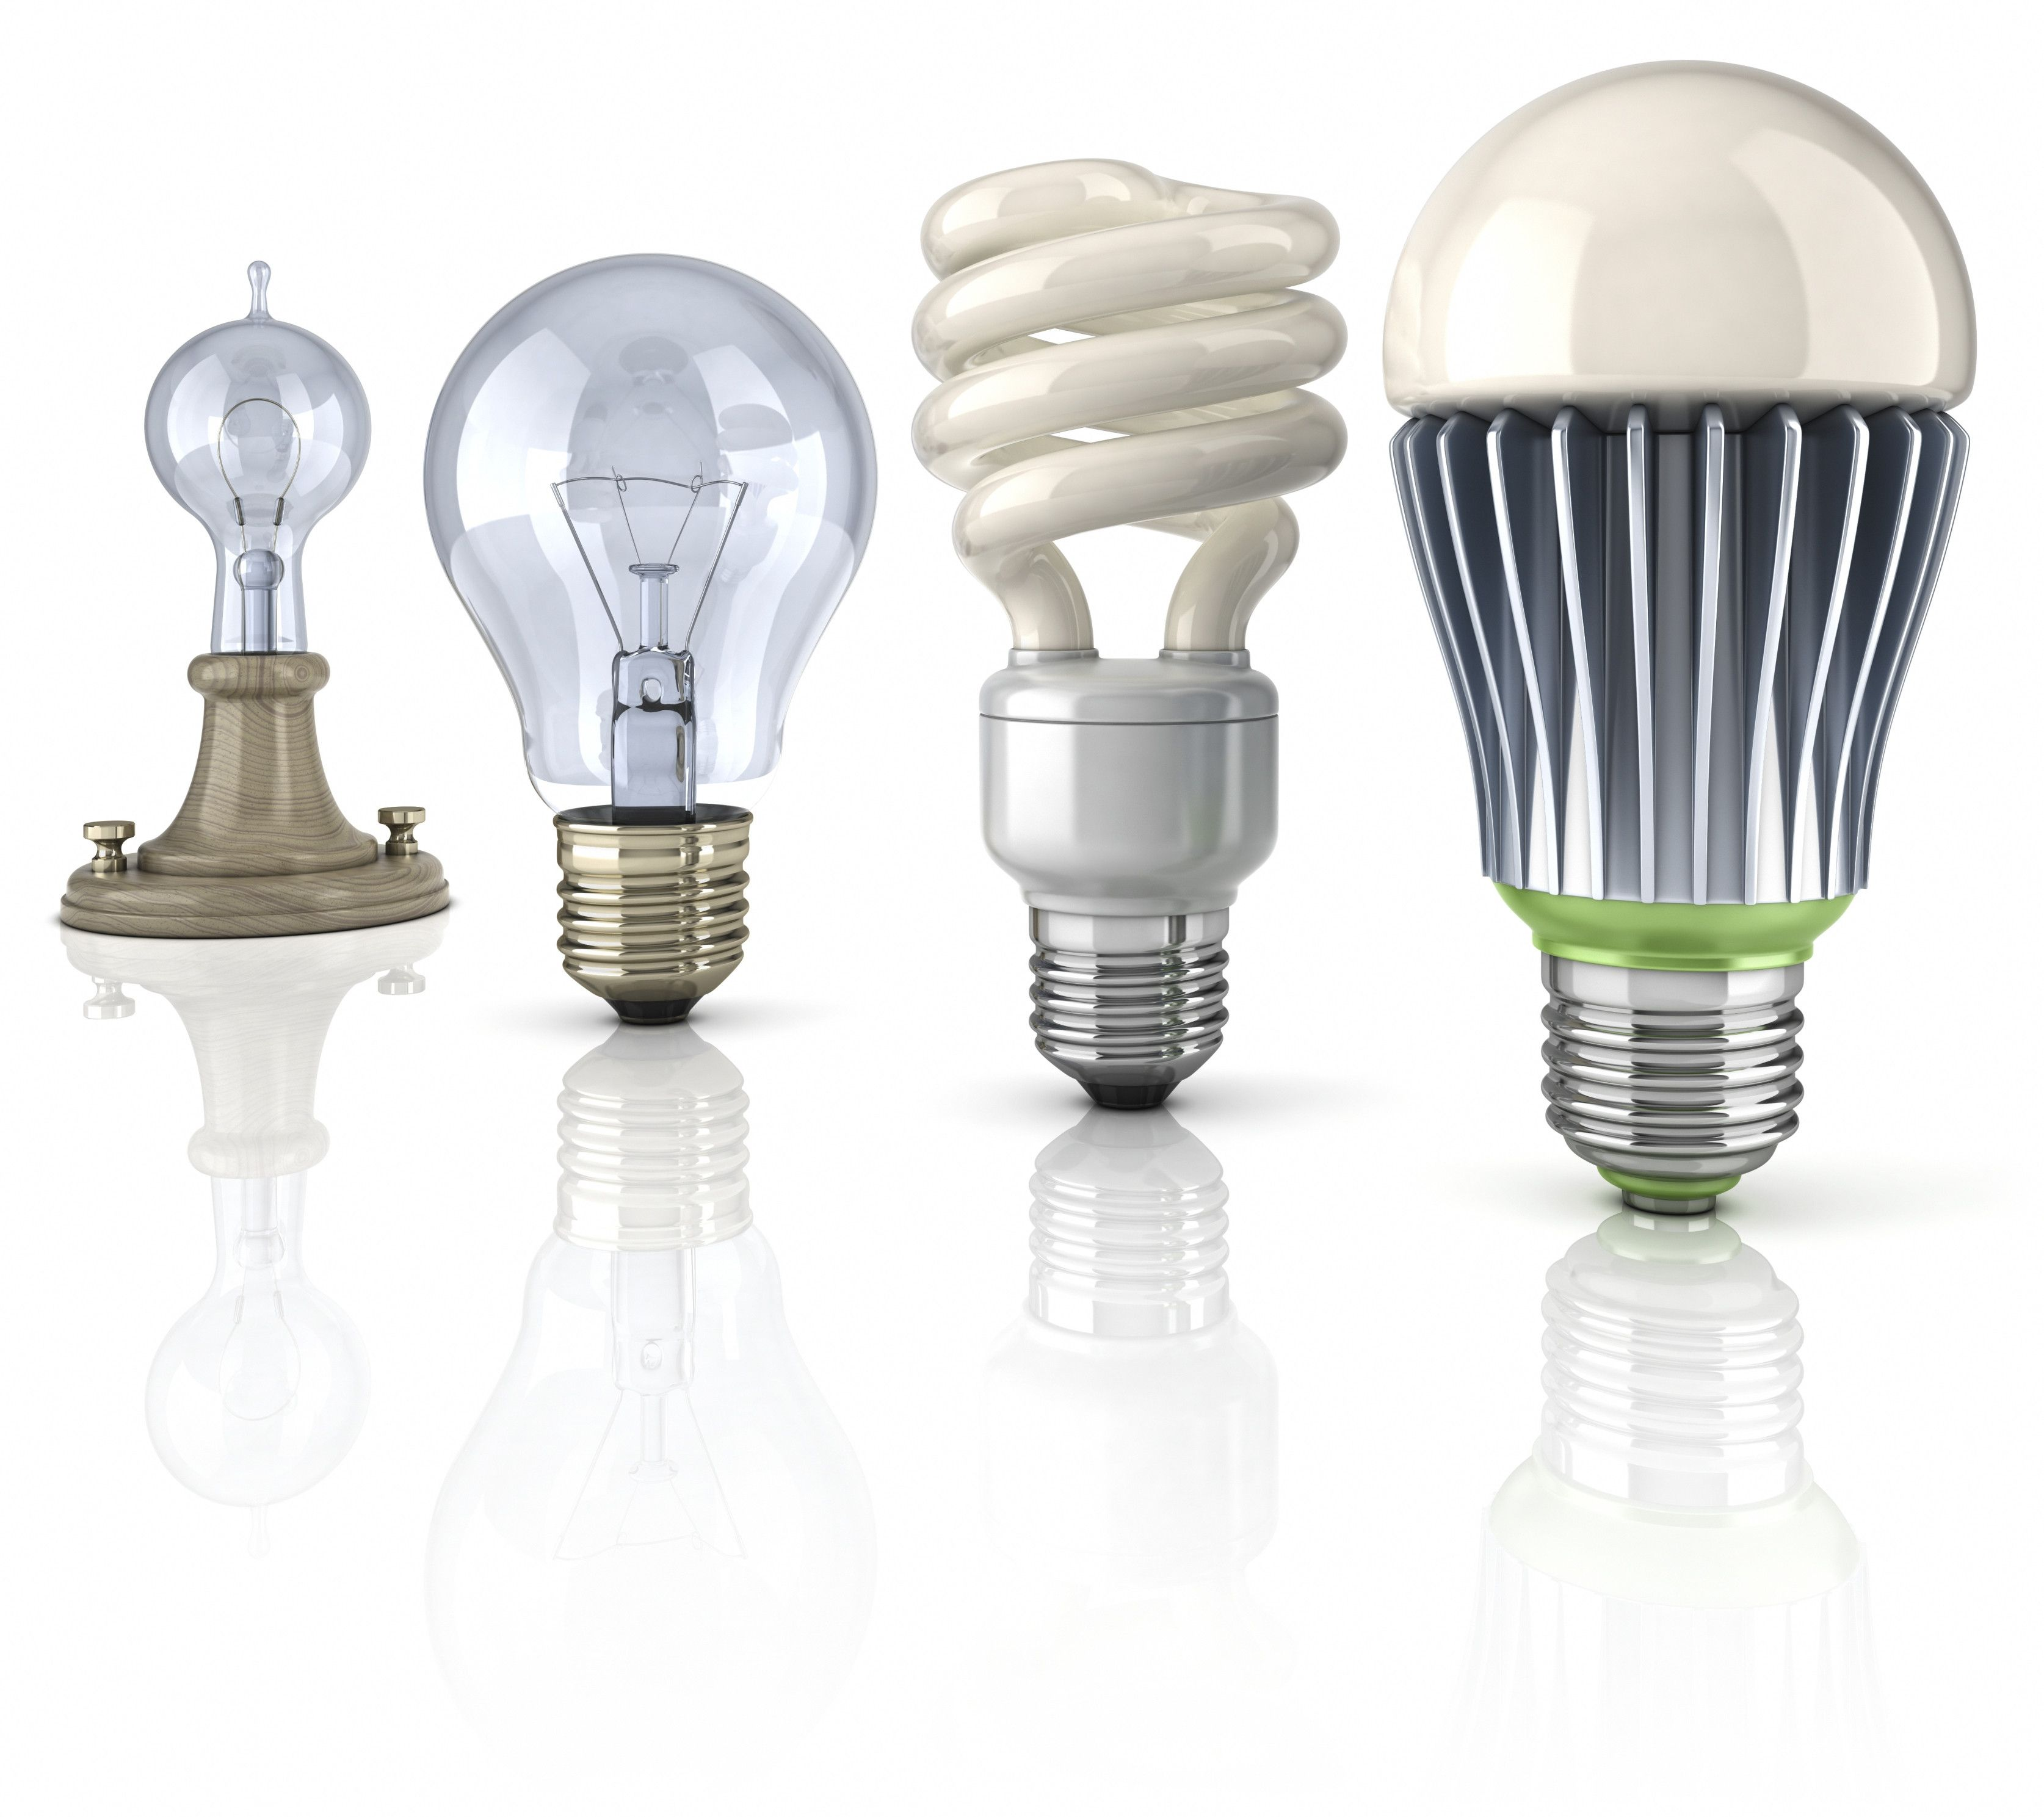 hello to say leds stops says goodbye light ge making cfls cfl go lighting reports bulbs lbevo